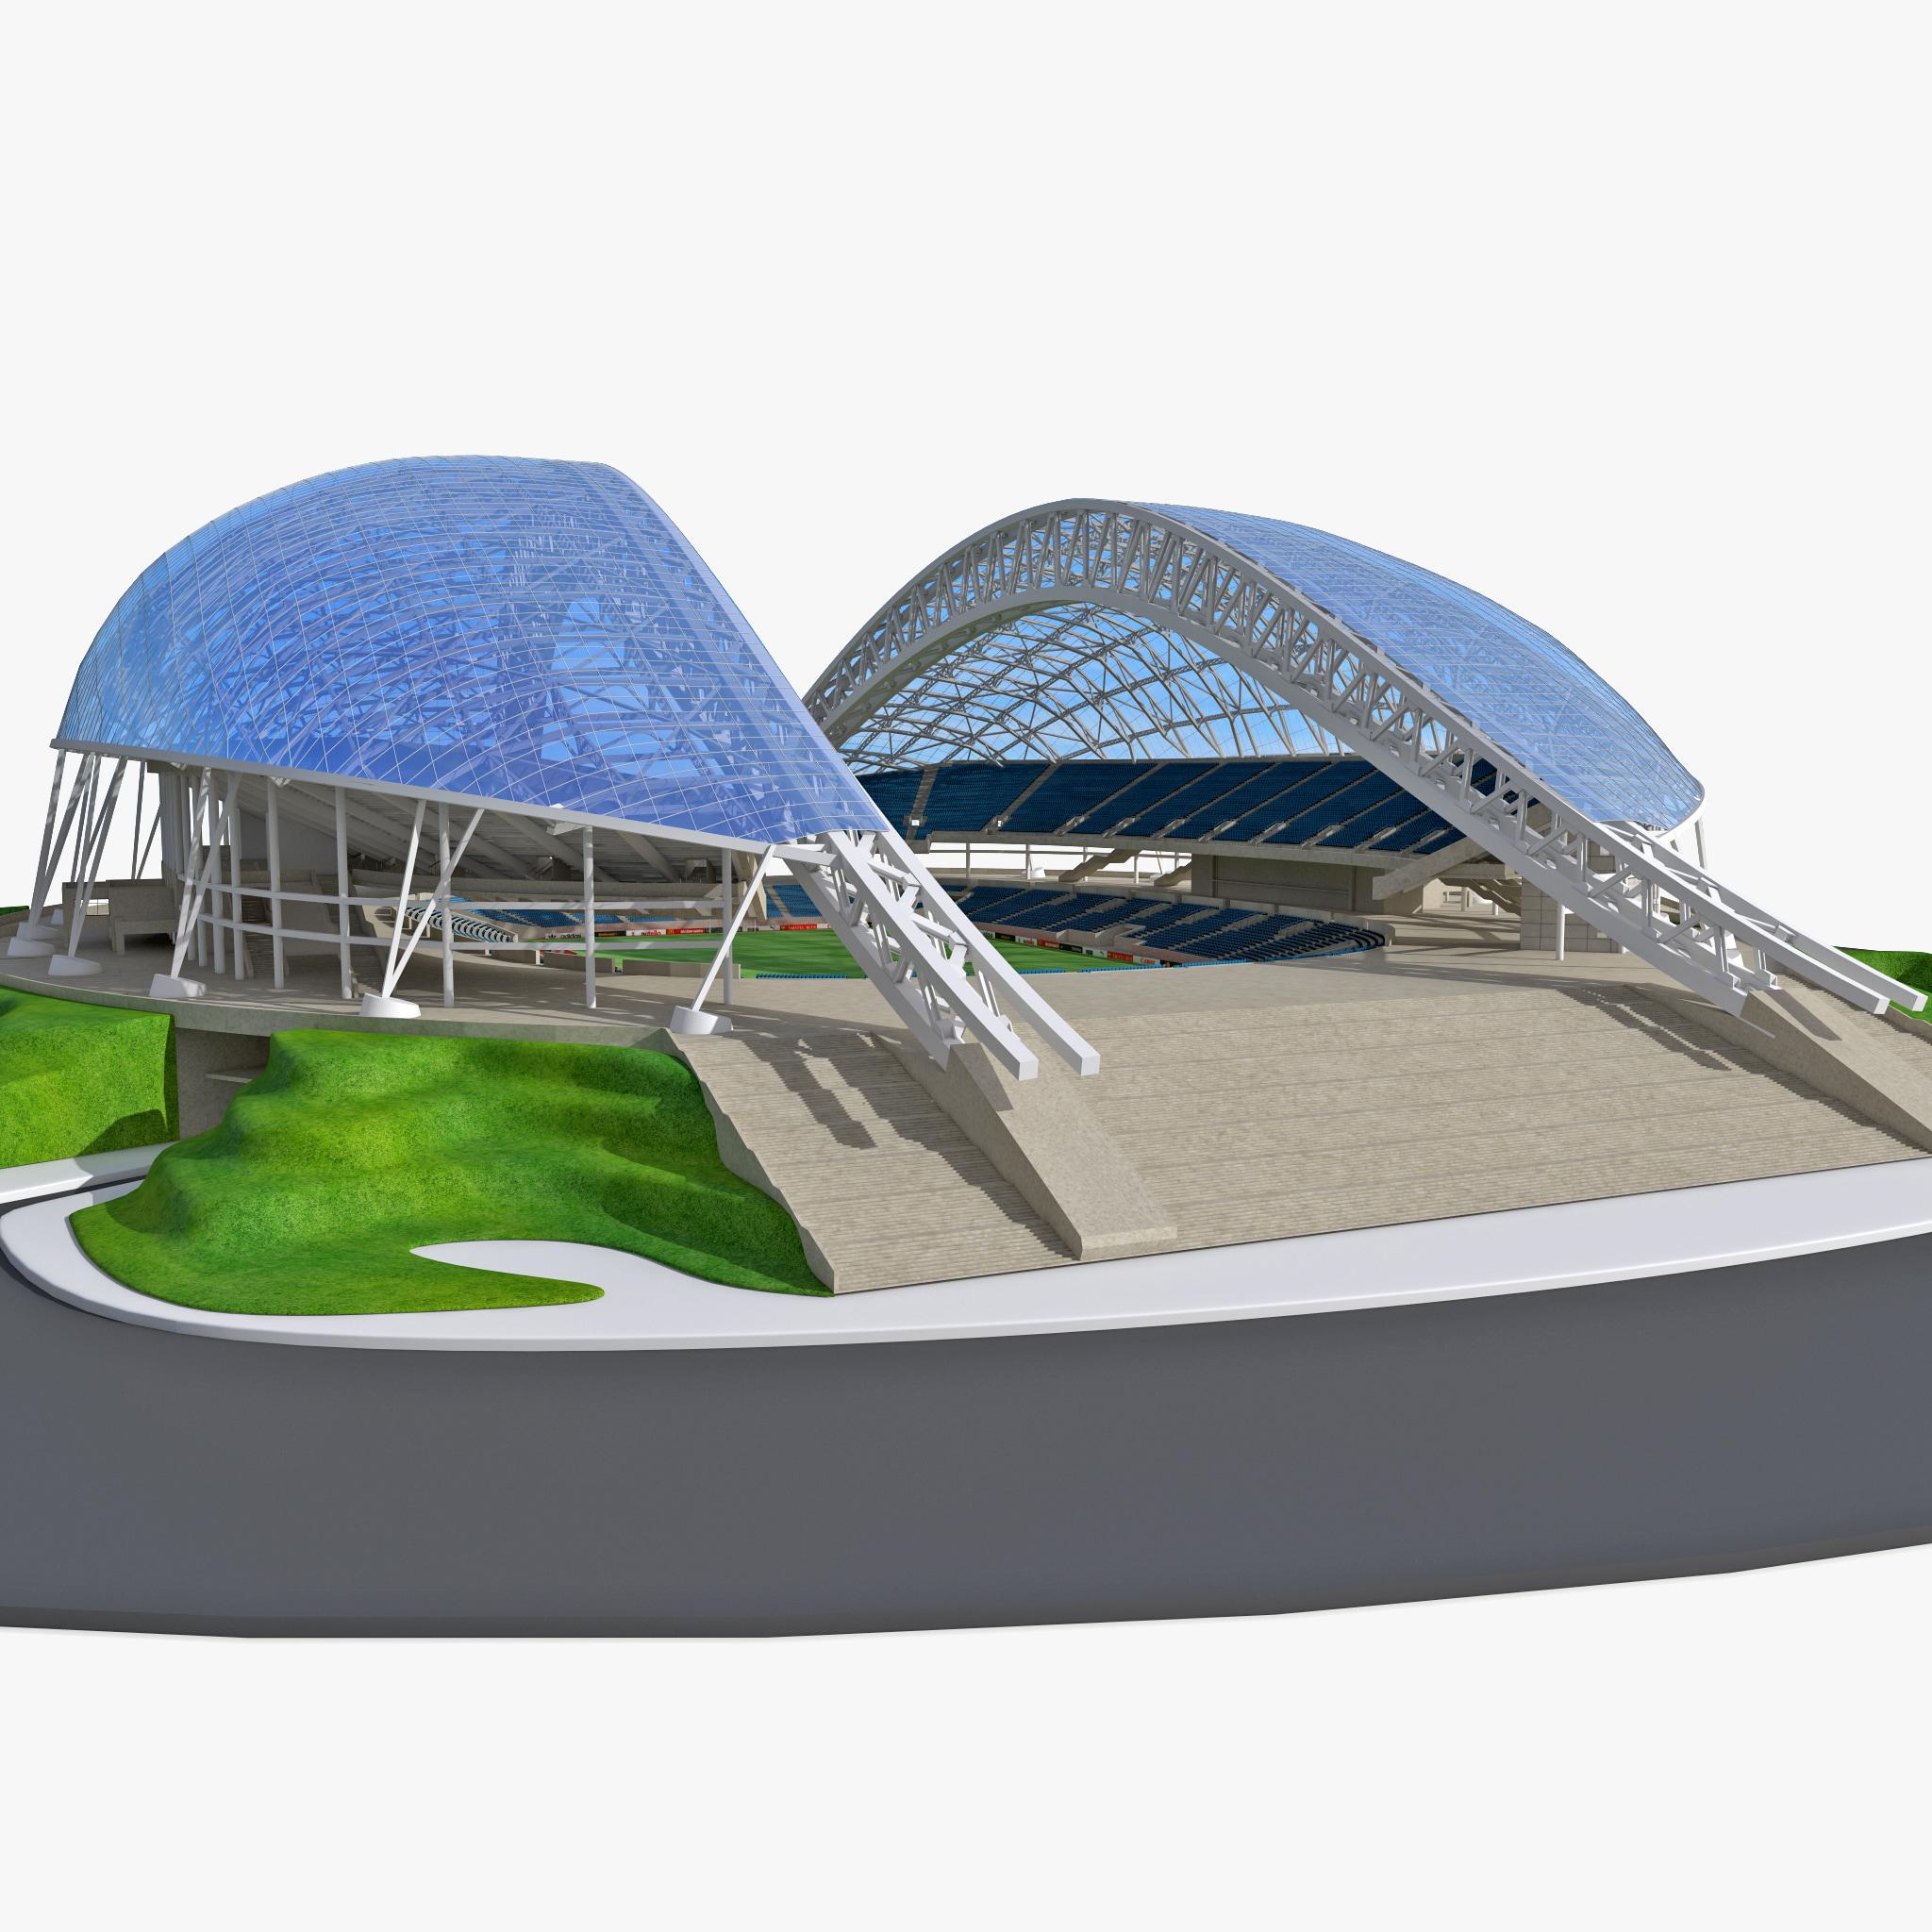 Fisht_Olympic_Stadium_Sochi_Russia_000.jpg